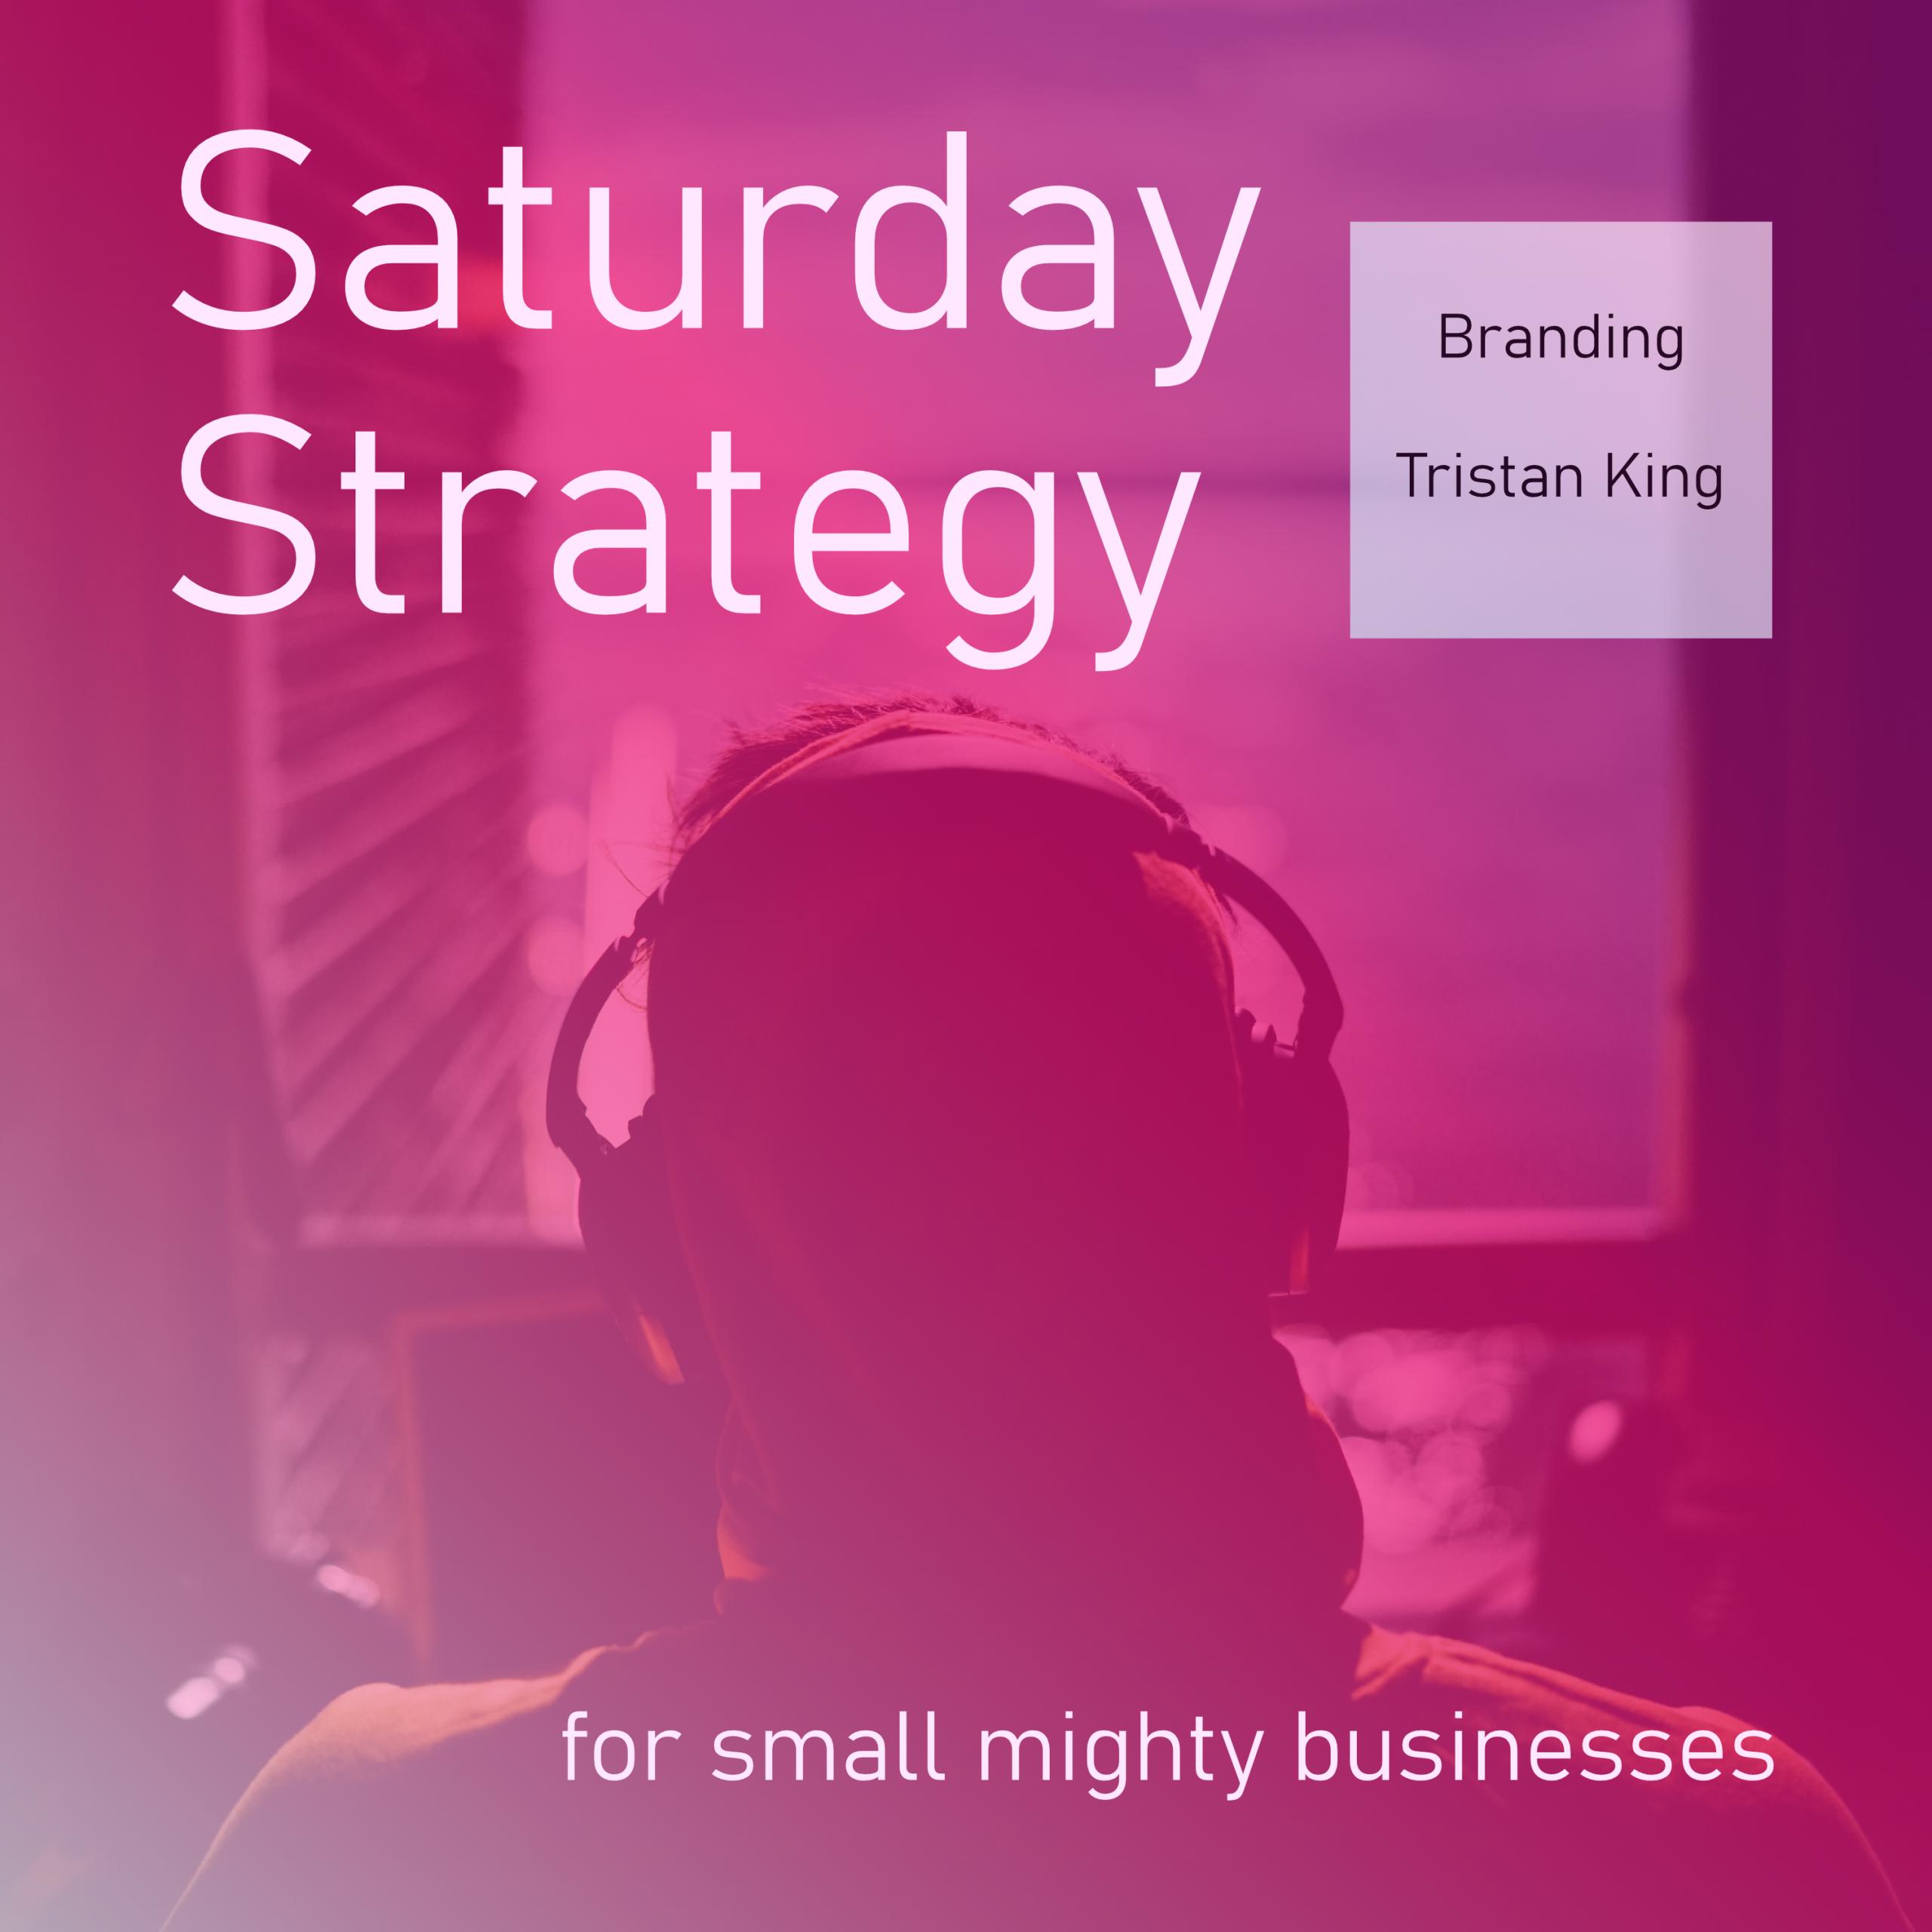 Saturday Strategy Branding Tristan King